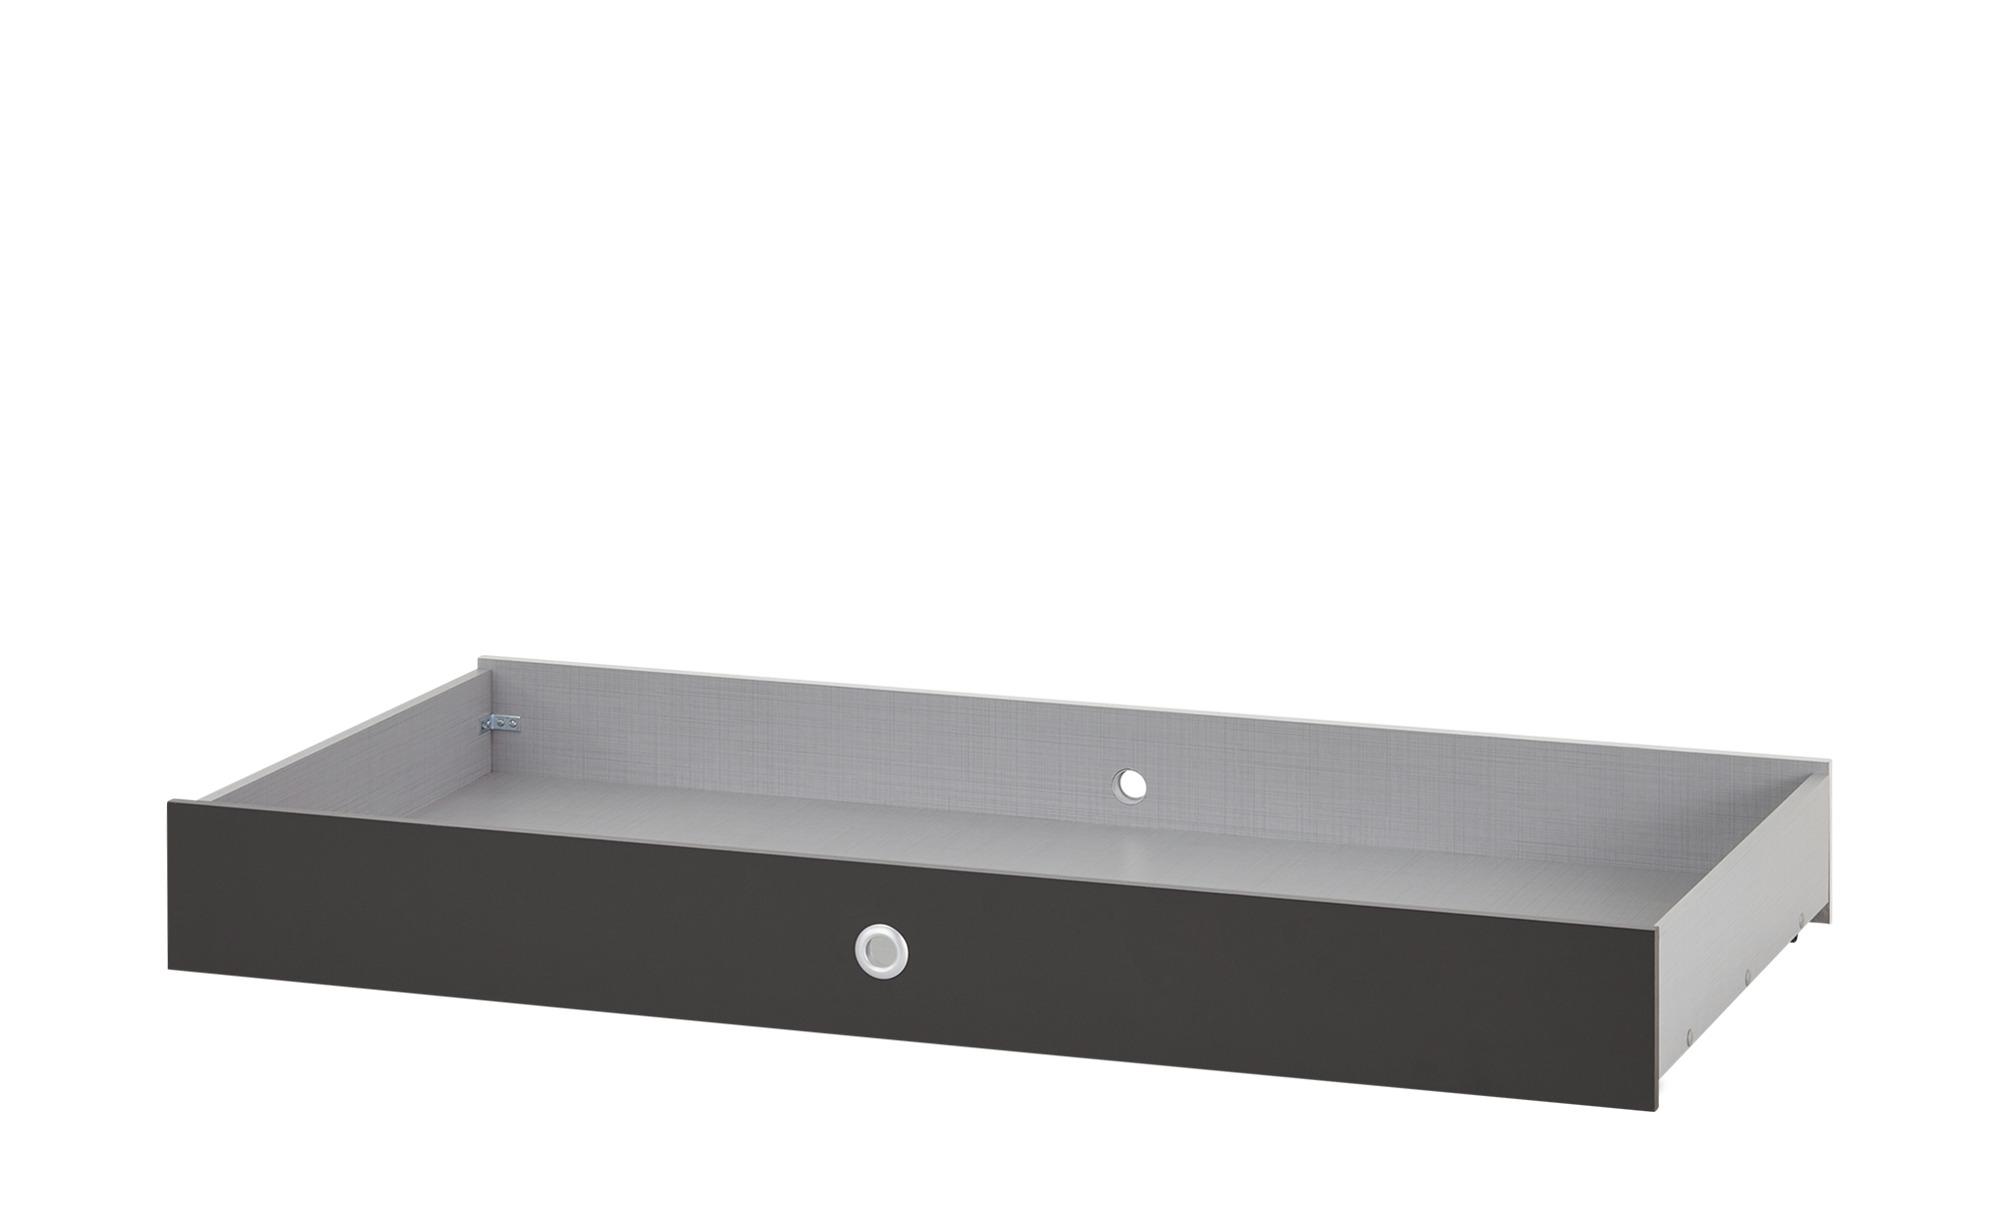 Bettschubkasten für Babybett  Cariba - holzfarben - 70 cm - 16 cm - 140 cm - Sconto